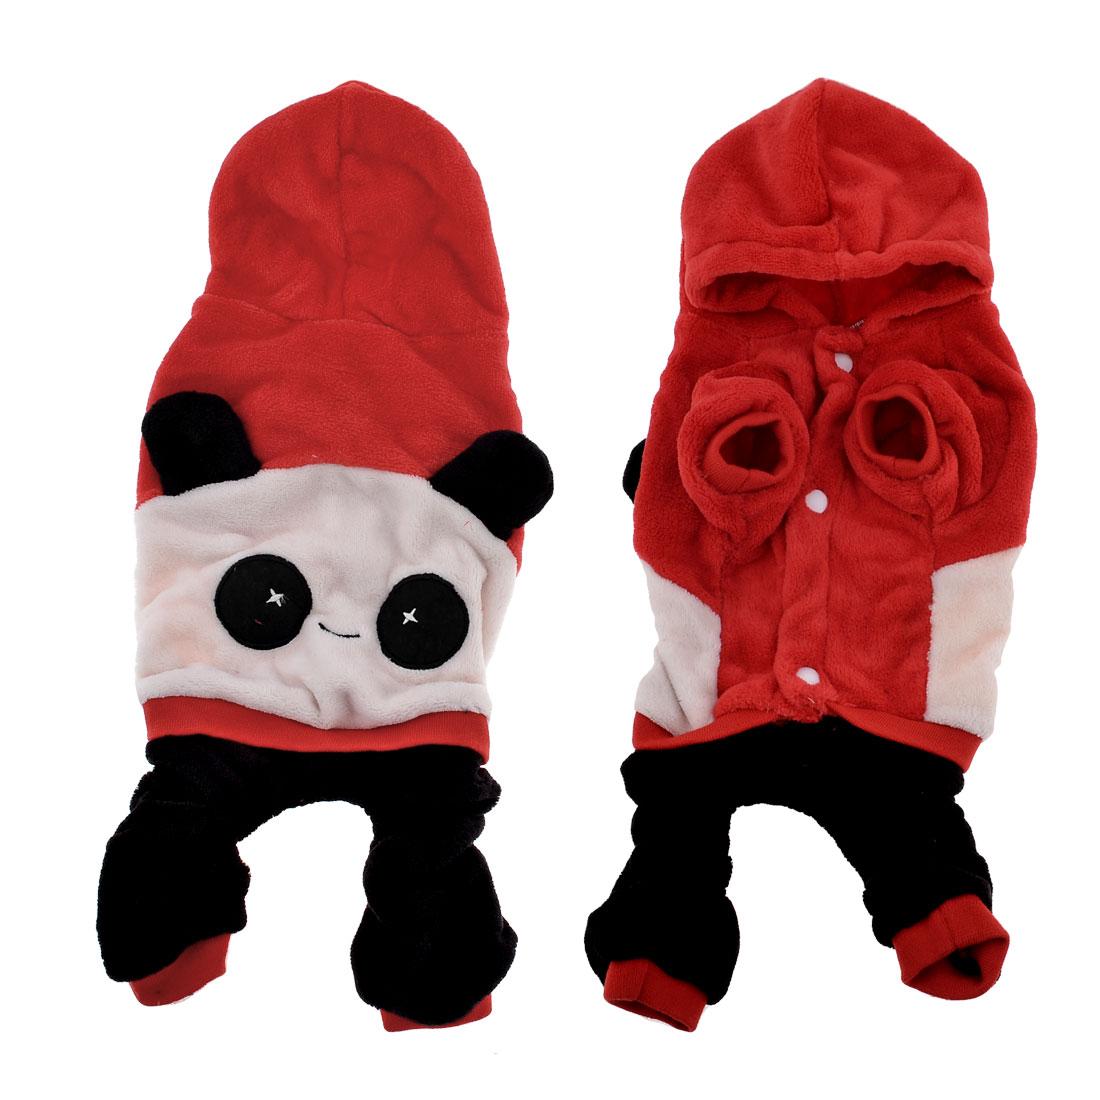 Warm Plush Panda Shape Chihuahua Pet Dog Cat Apparel Clothes Jumpsuit Red XS